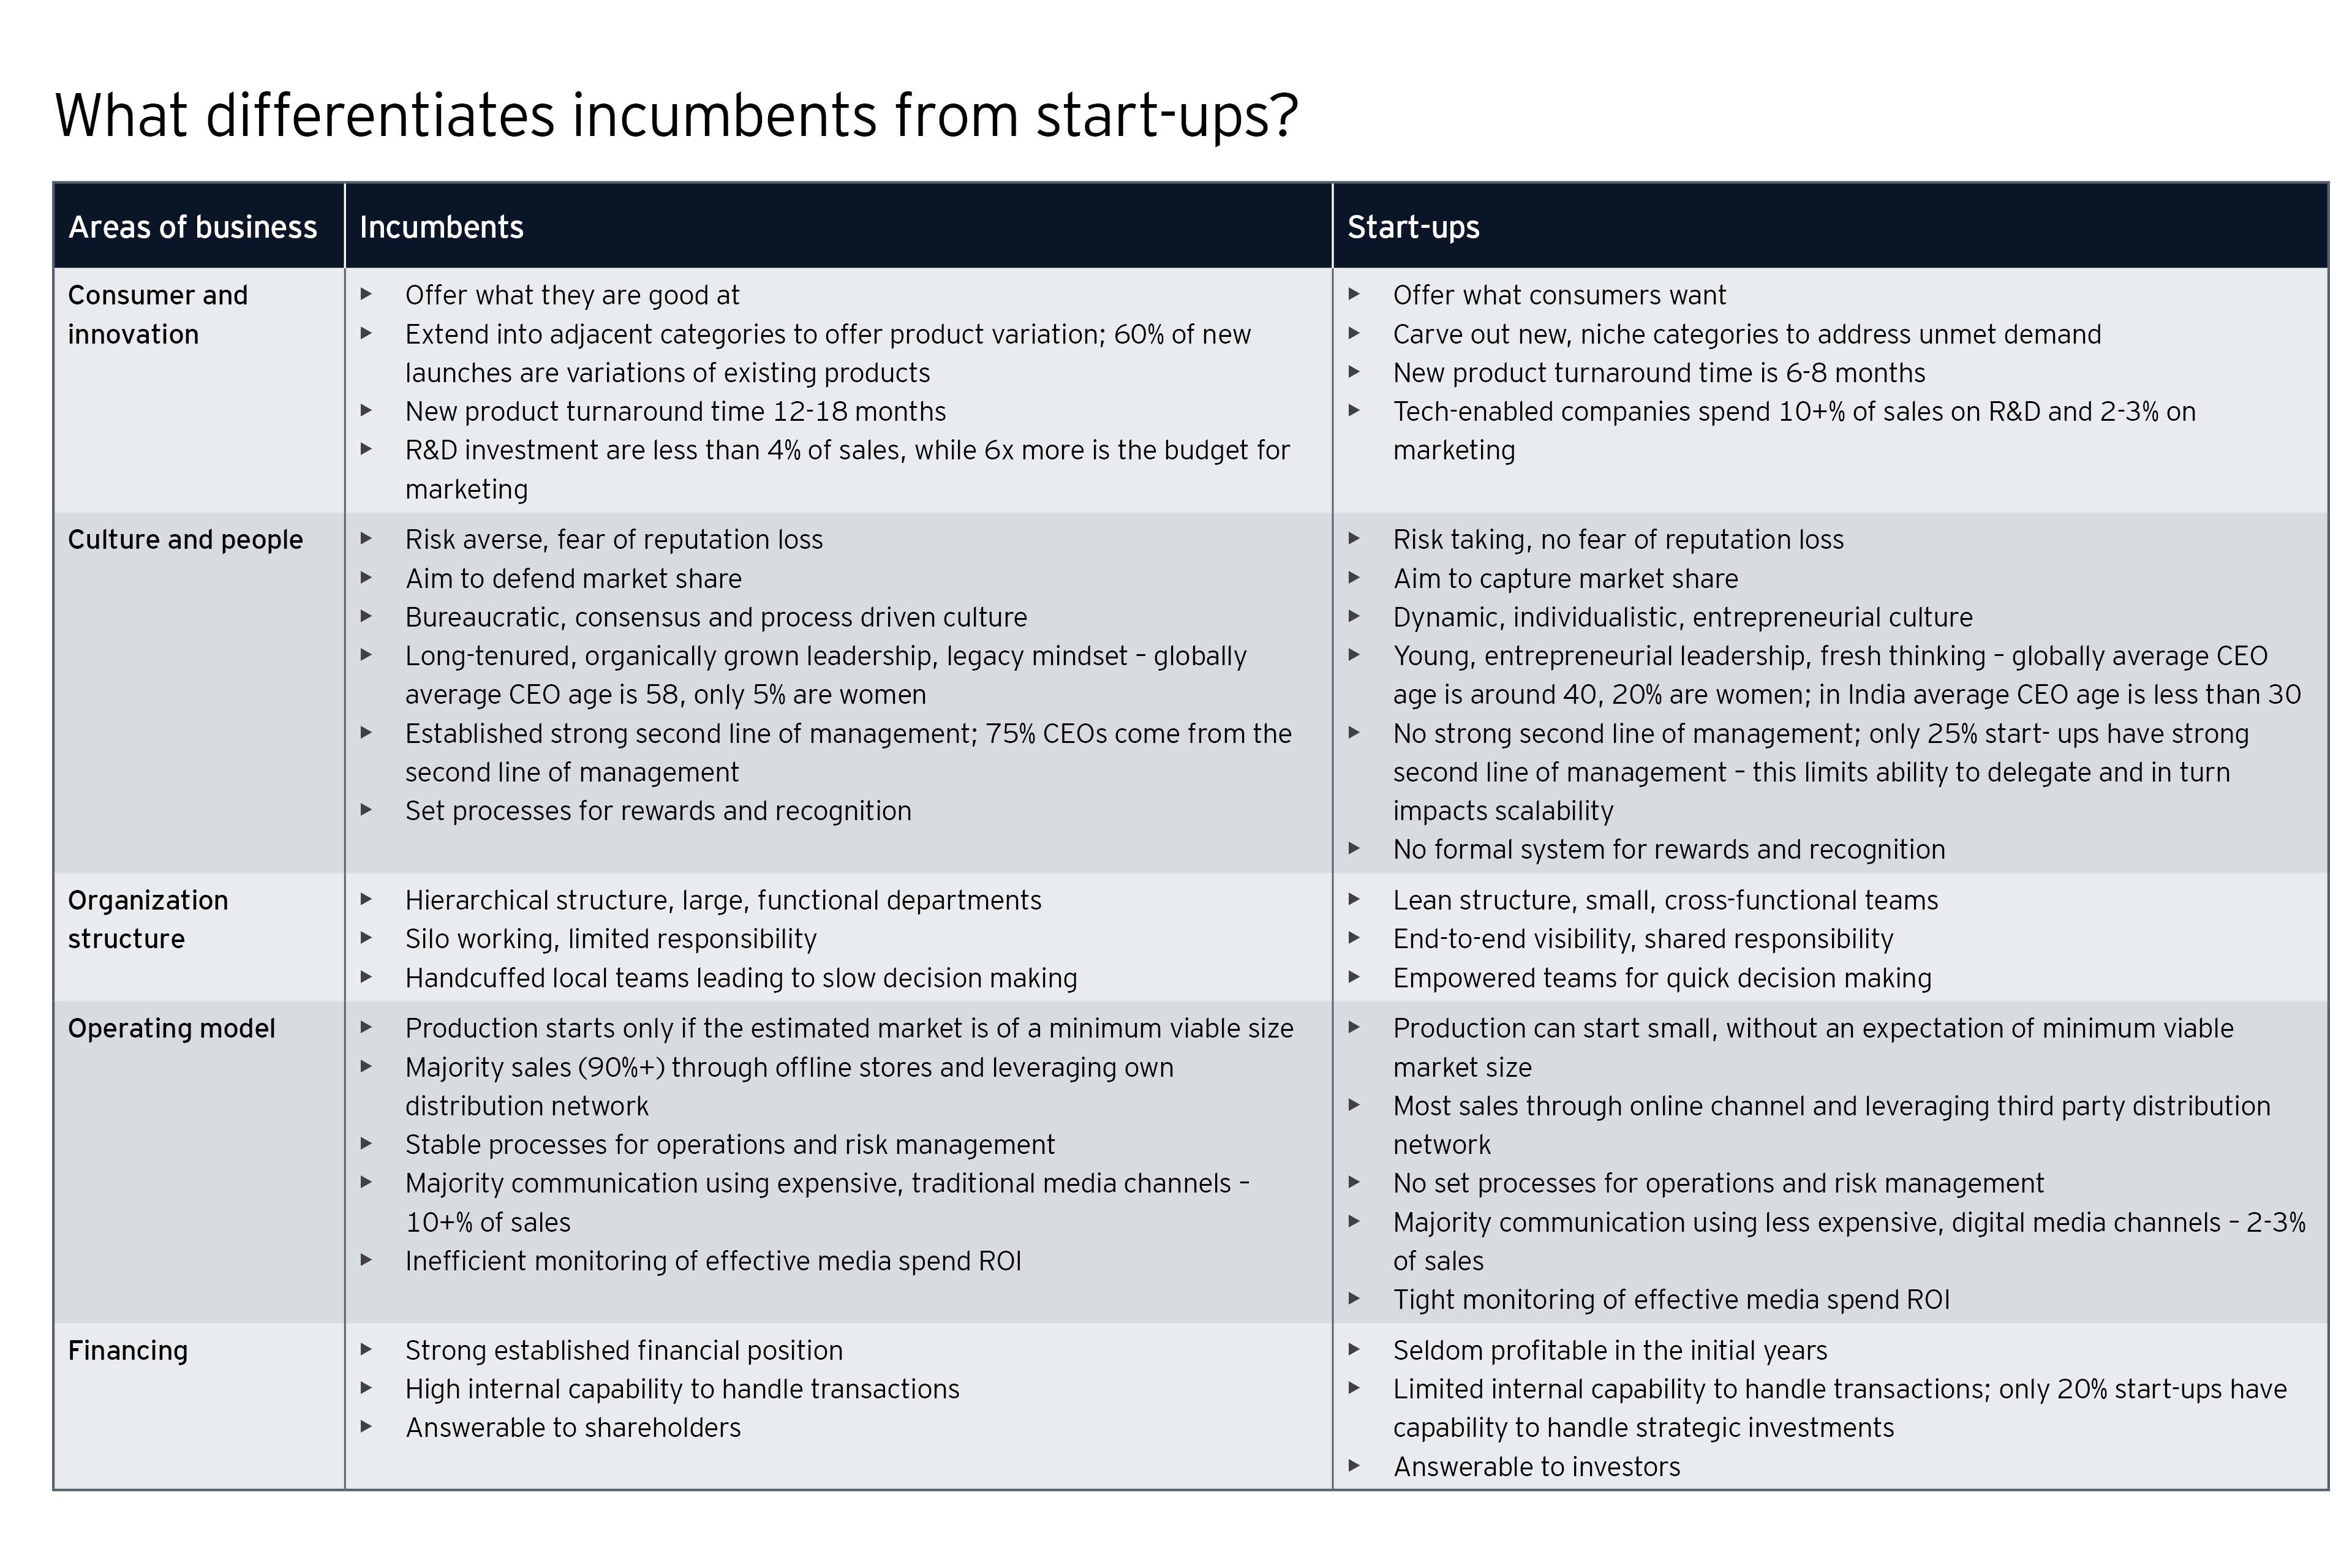 Key differentiators between incumbents and start-ups